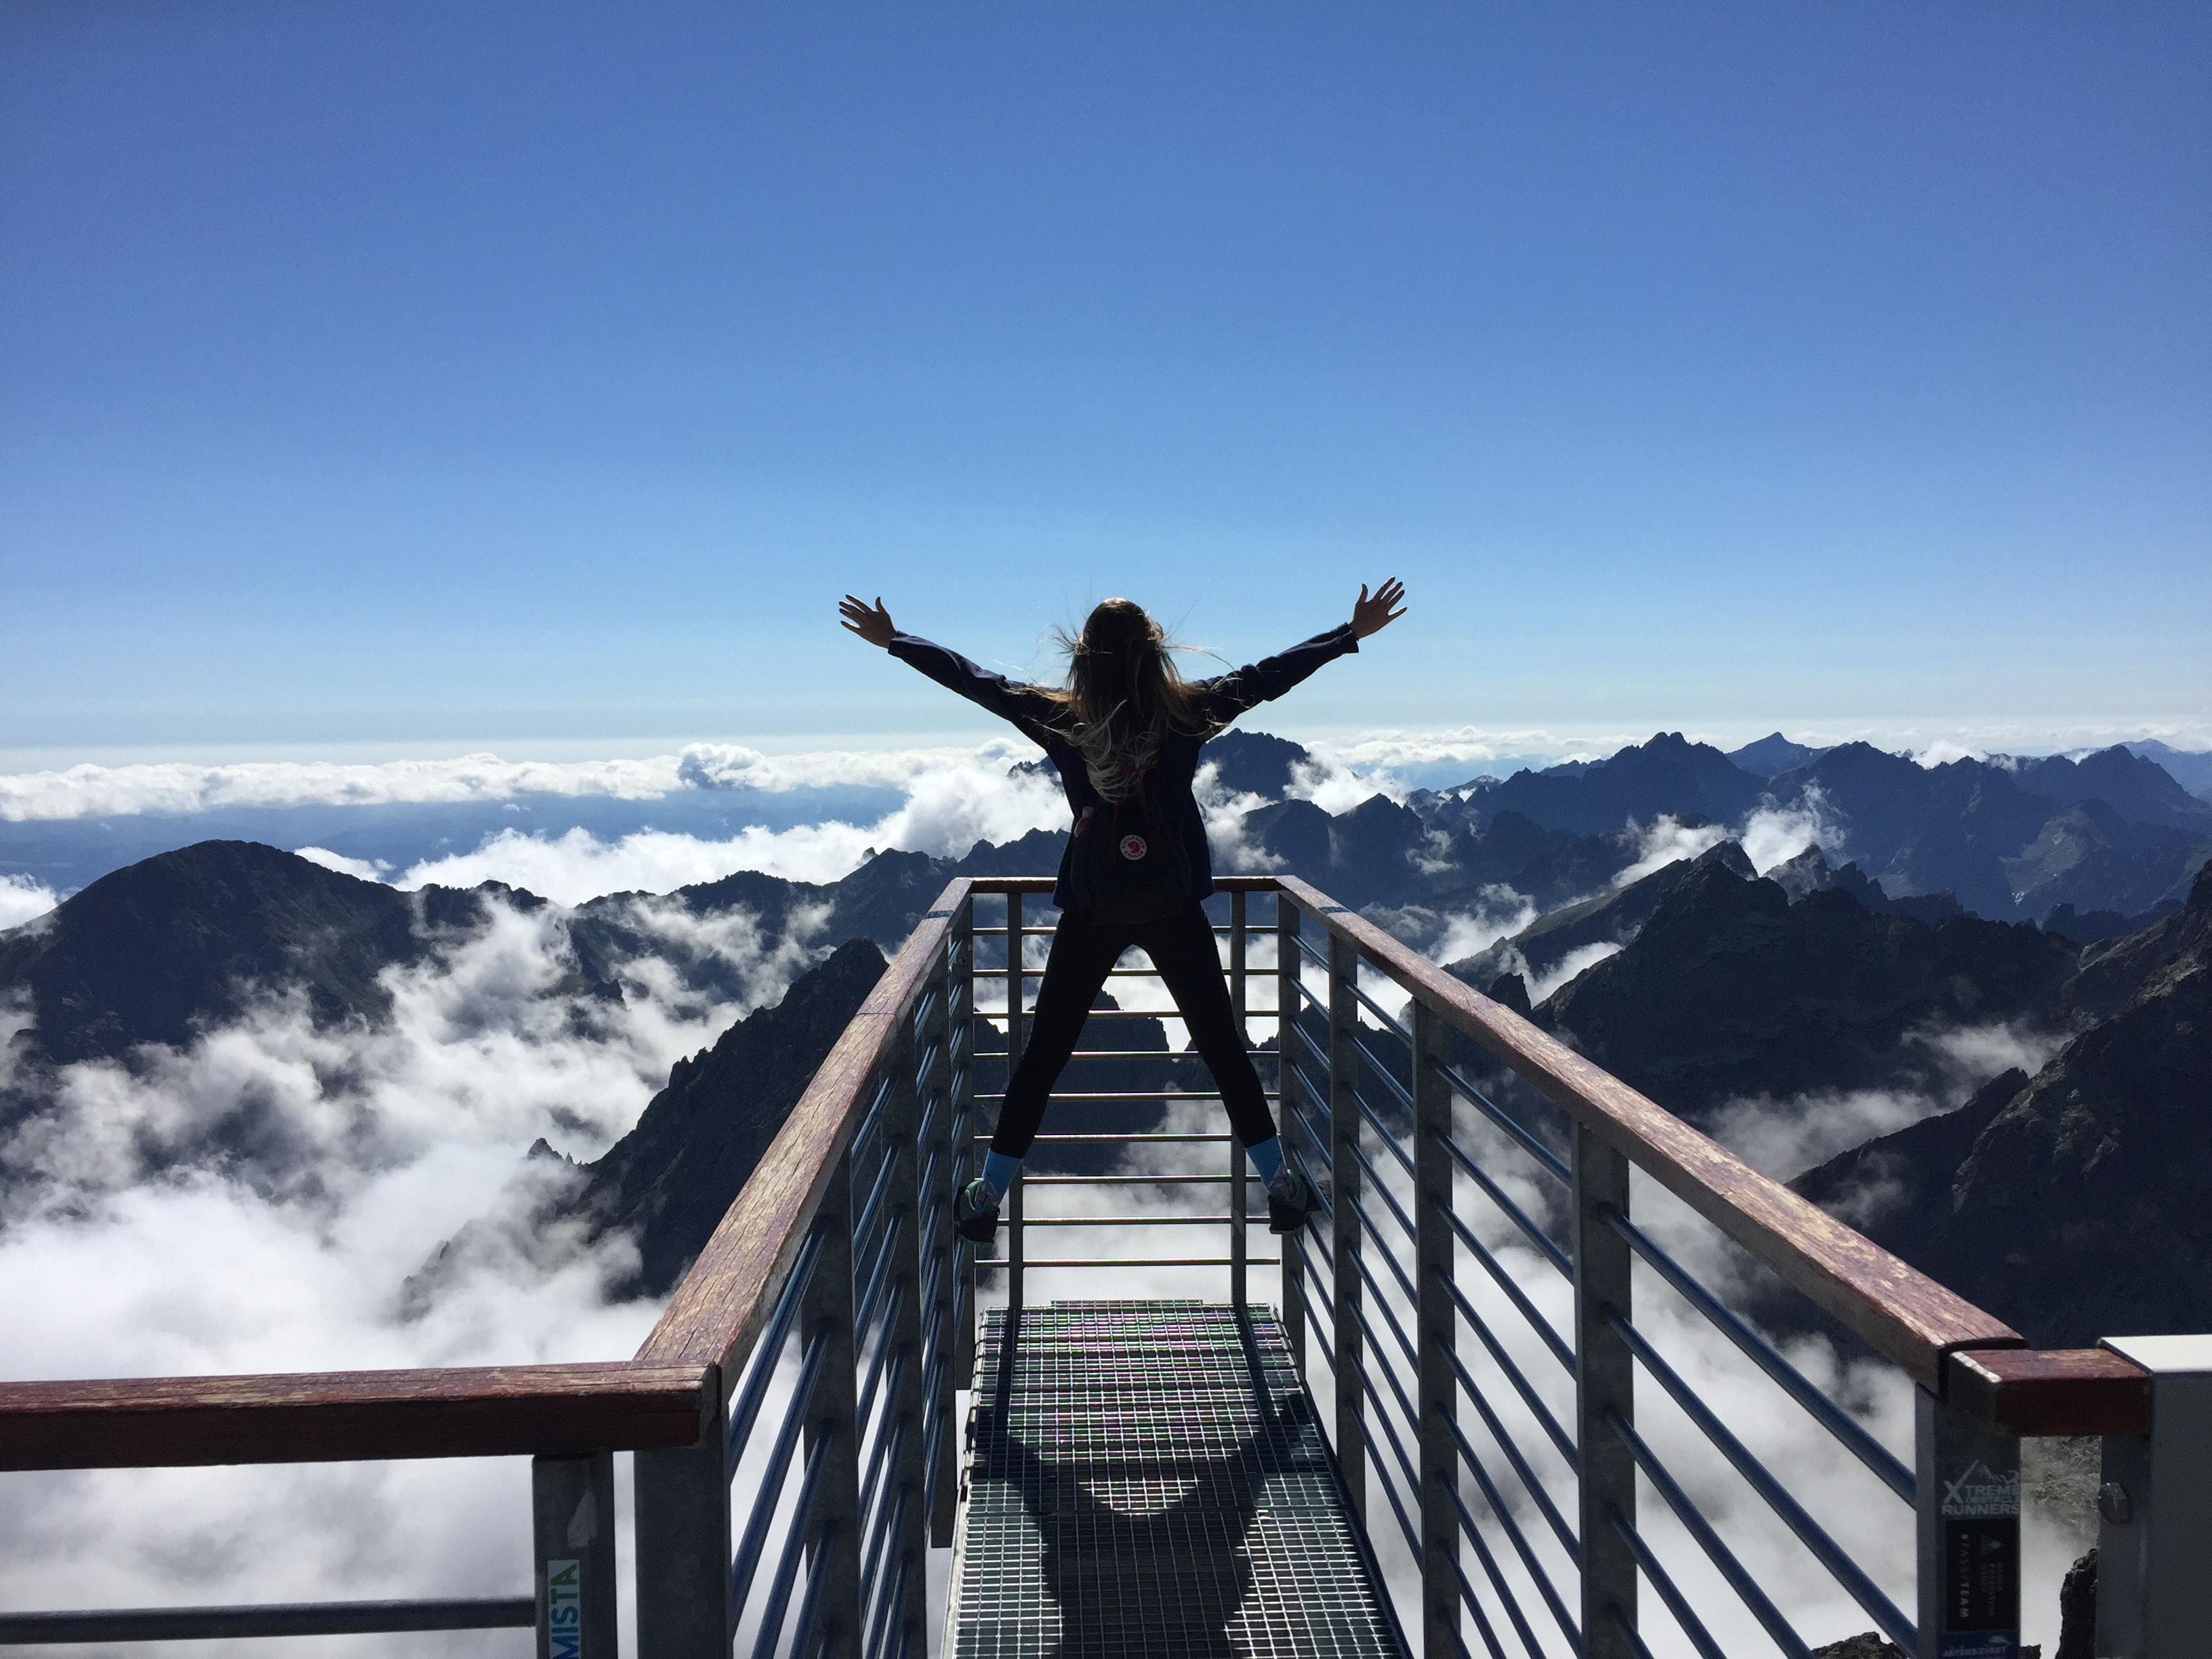 Happy woman overlooking a snowy mountain range